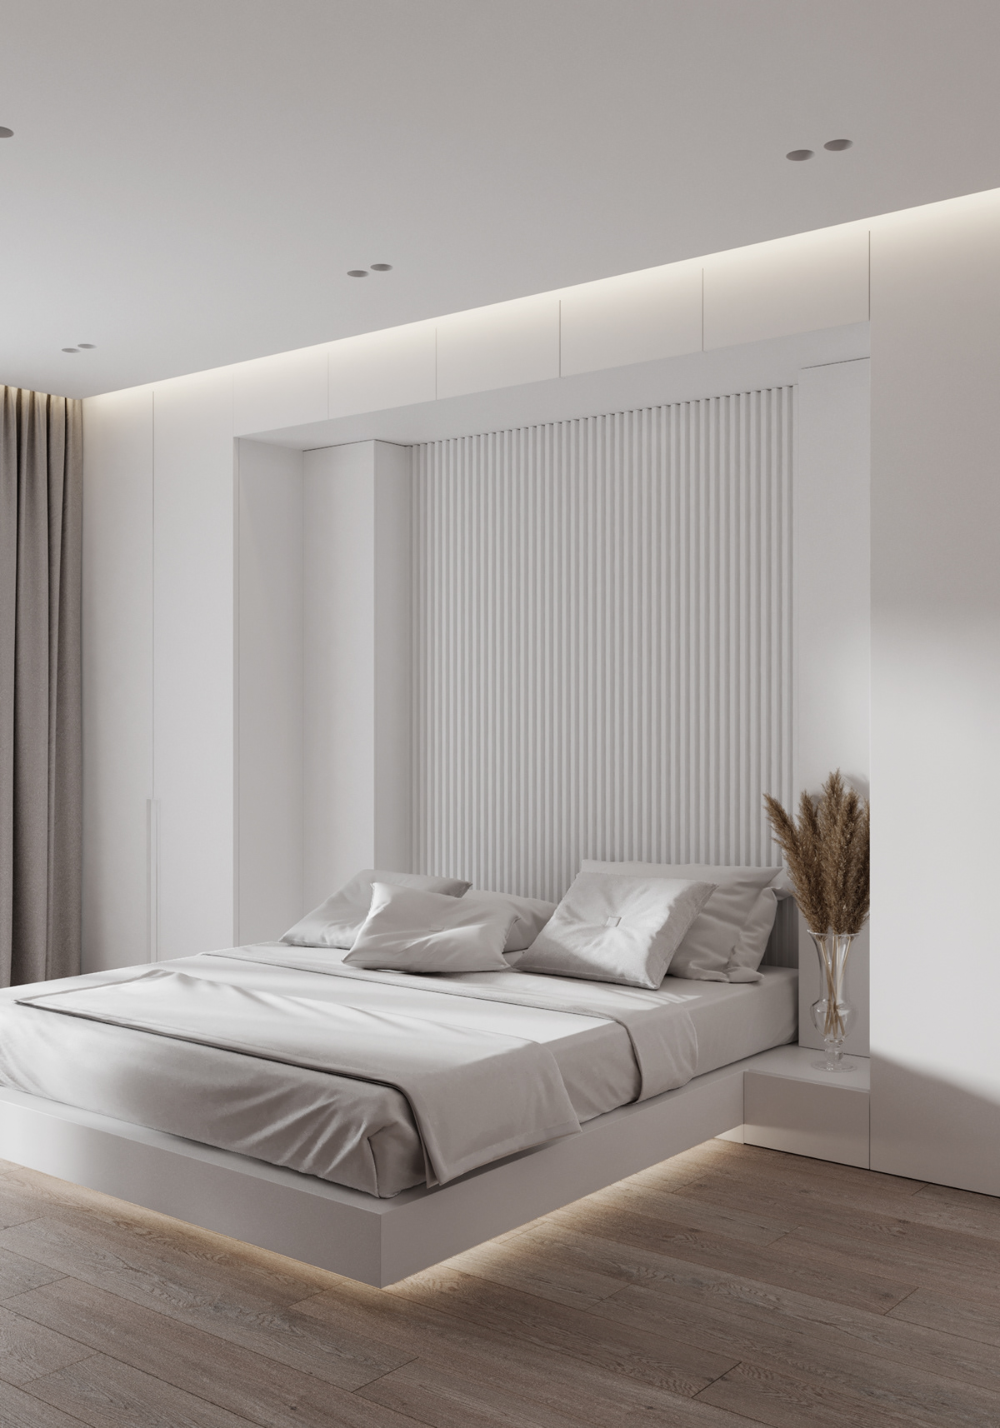 20 AP I soft. on Behance   Room design bedroom, Luxury bedroom master ...